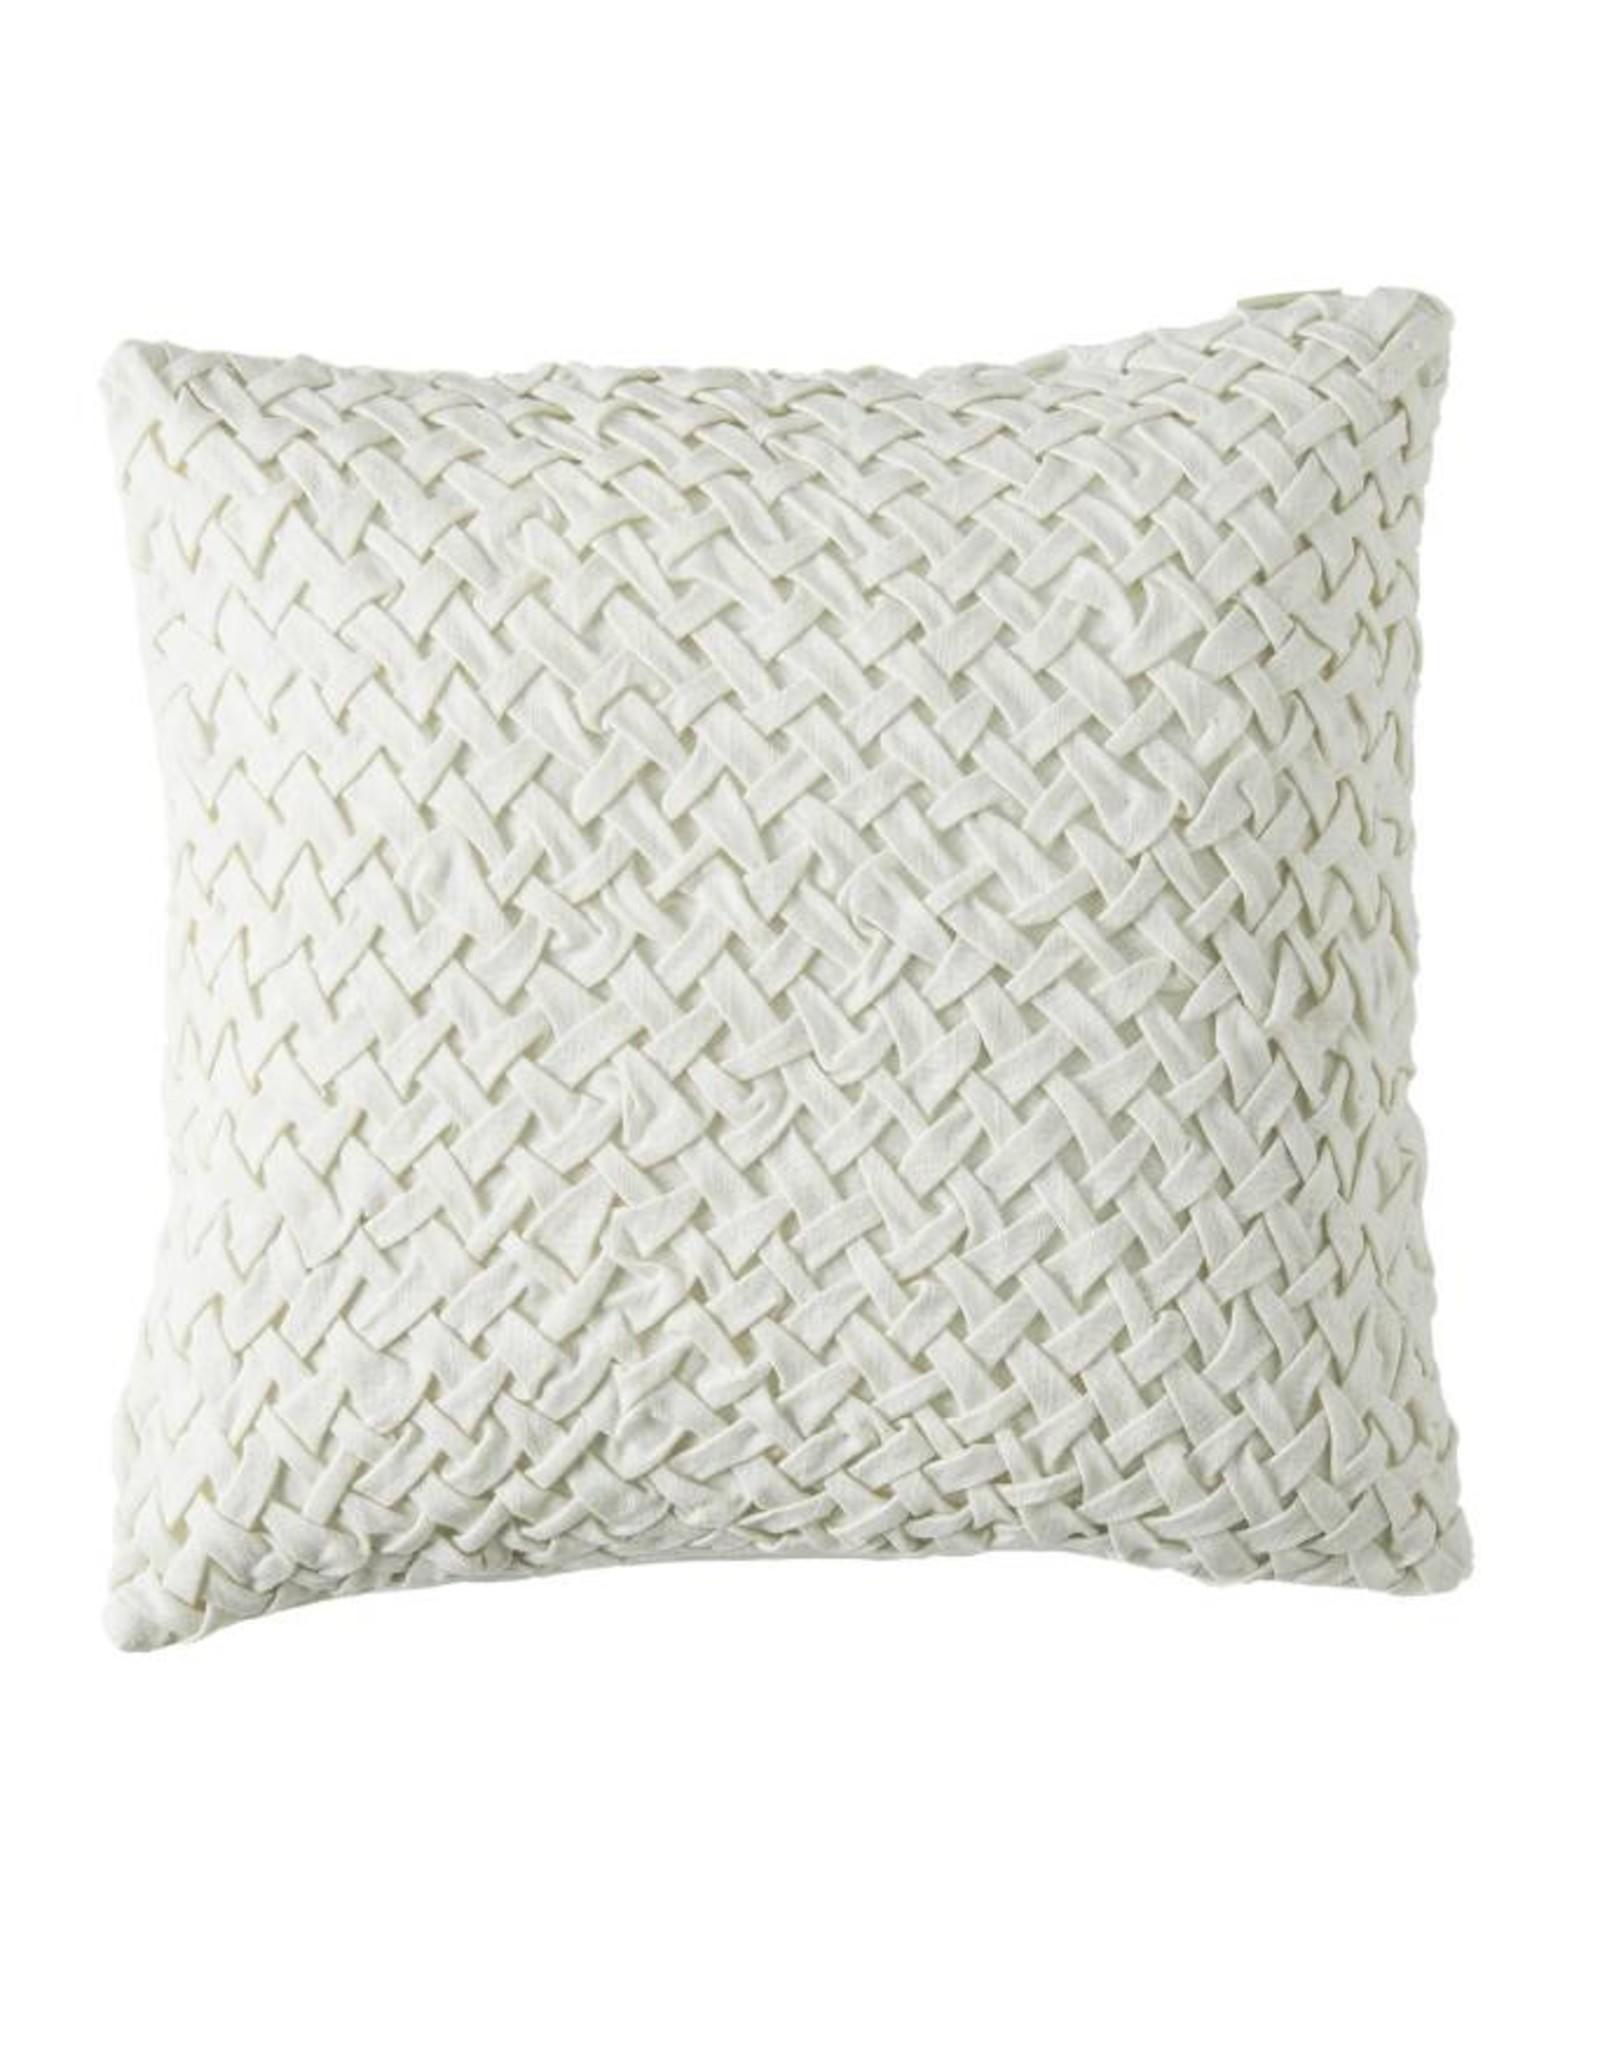 Riviera Maison Whimsical Weave P.C. white 50x50